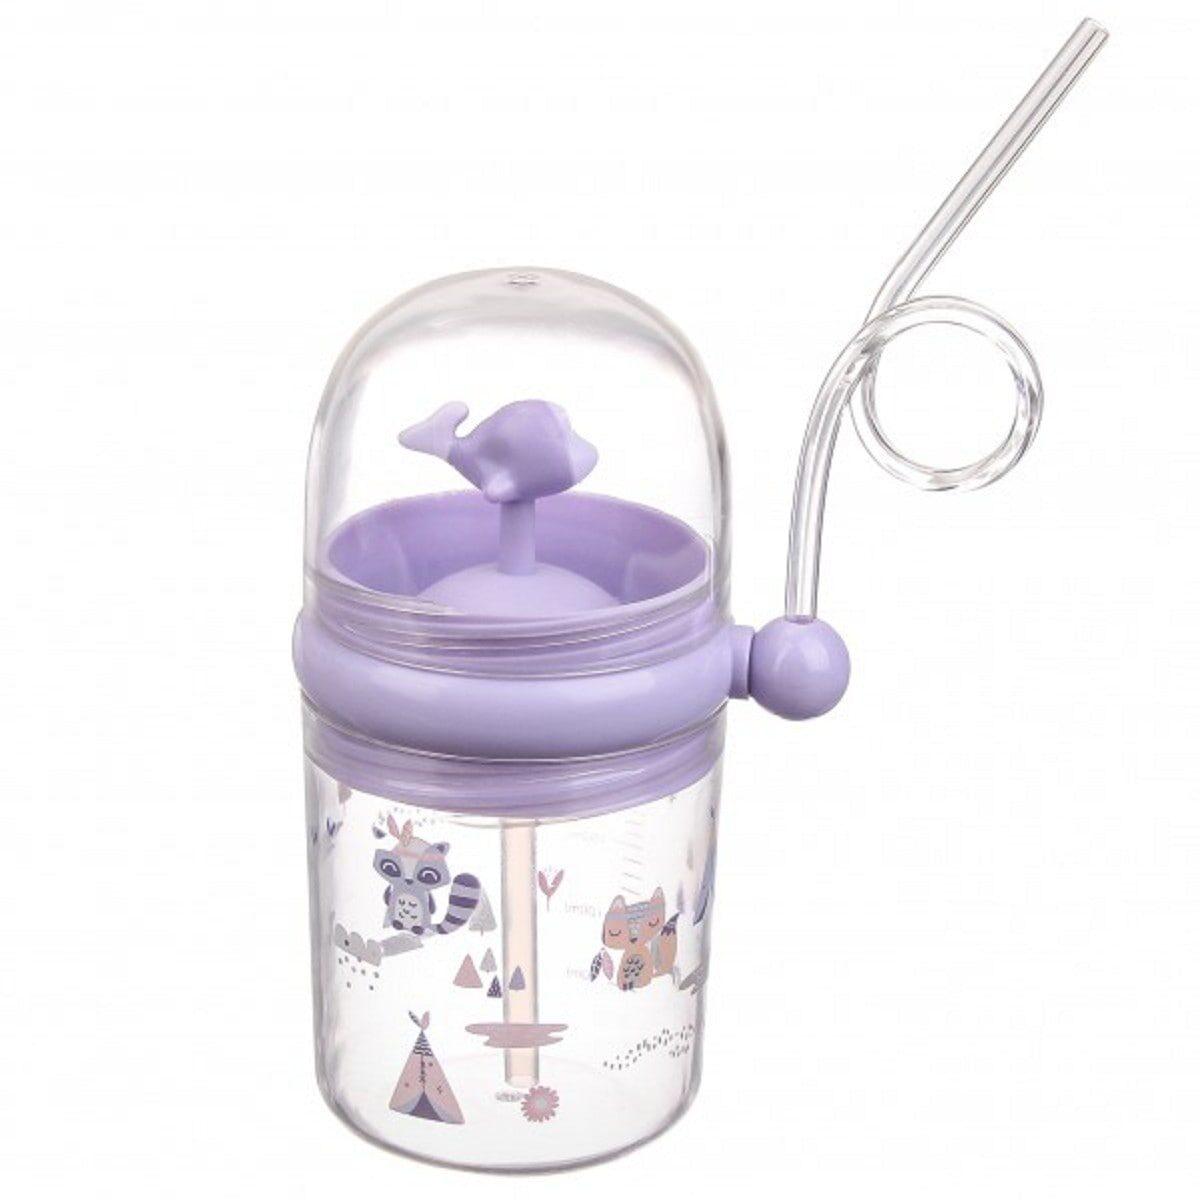 Пляшка дитяча пластикова з фонтанчиком 260мл